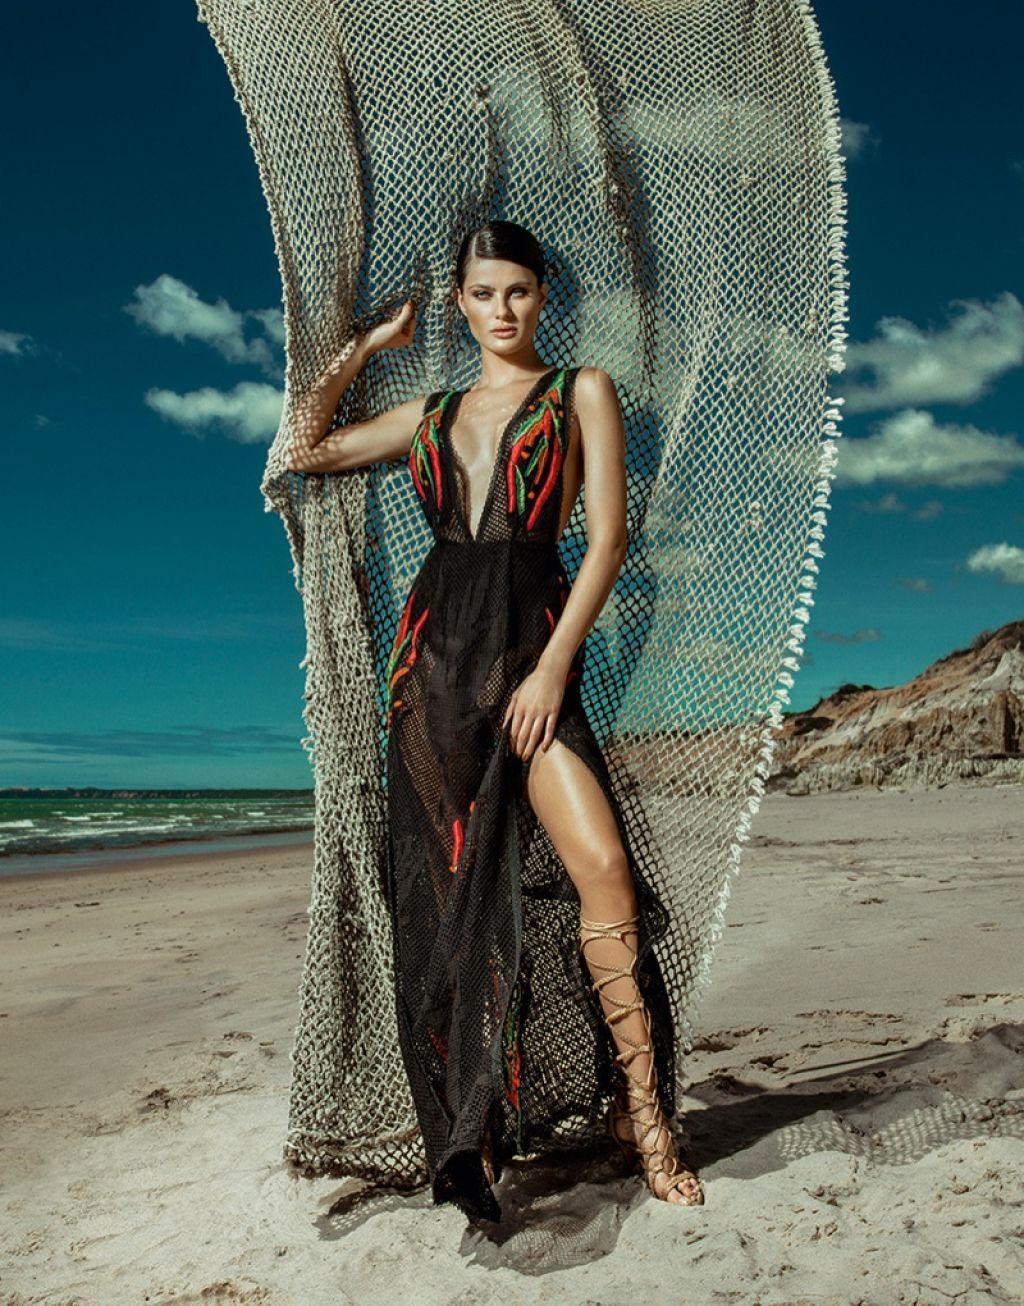 Agua de Coco Summer 2016 Campaign featuring Isabeli Fontana